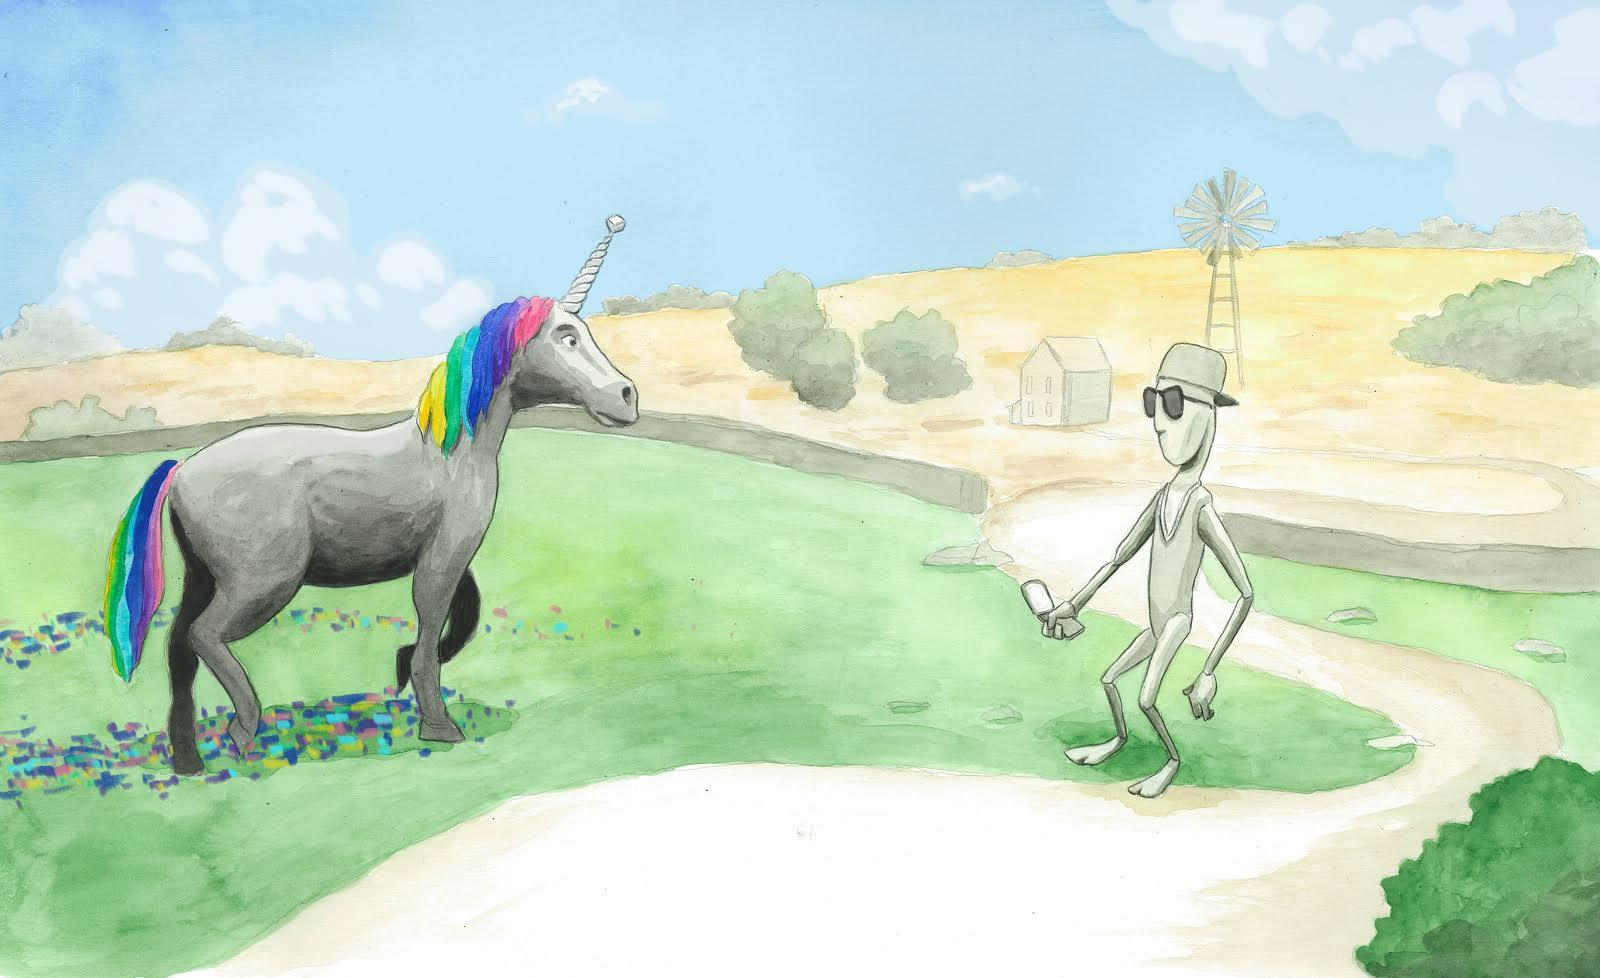 Illustration by Robert Liu-Trujillo.  See his work here .